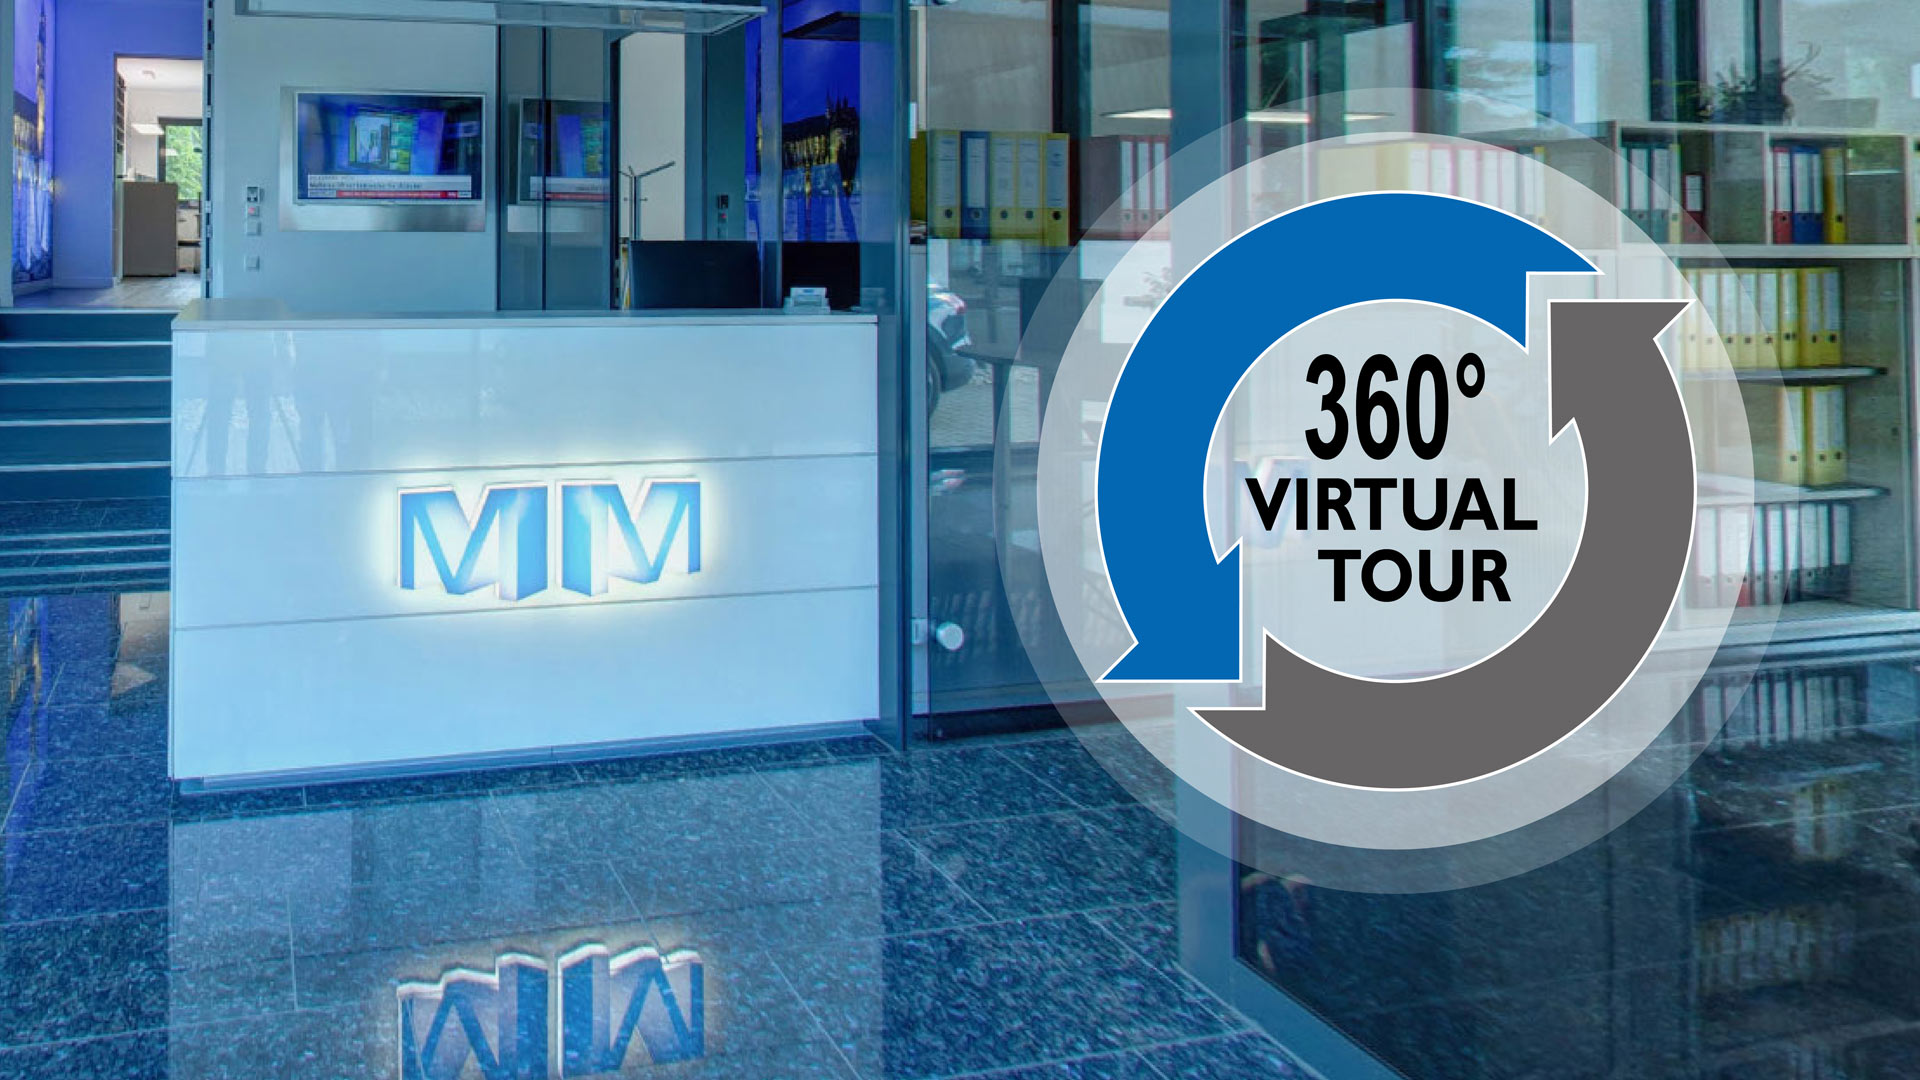 Metallbau Medoch GmbH in Magdeburg - 360 Grad Virtual Tour